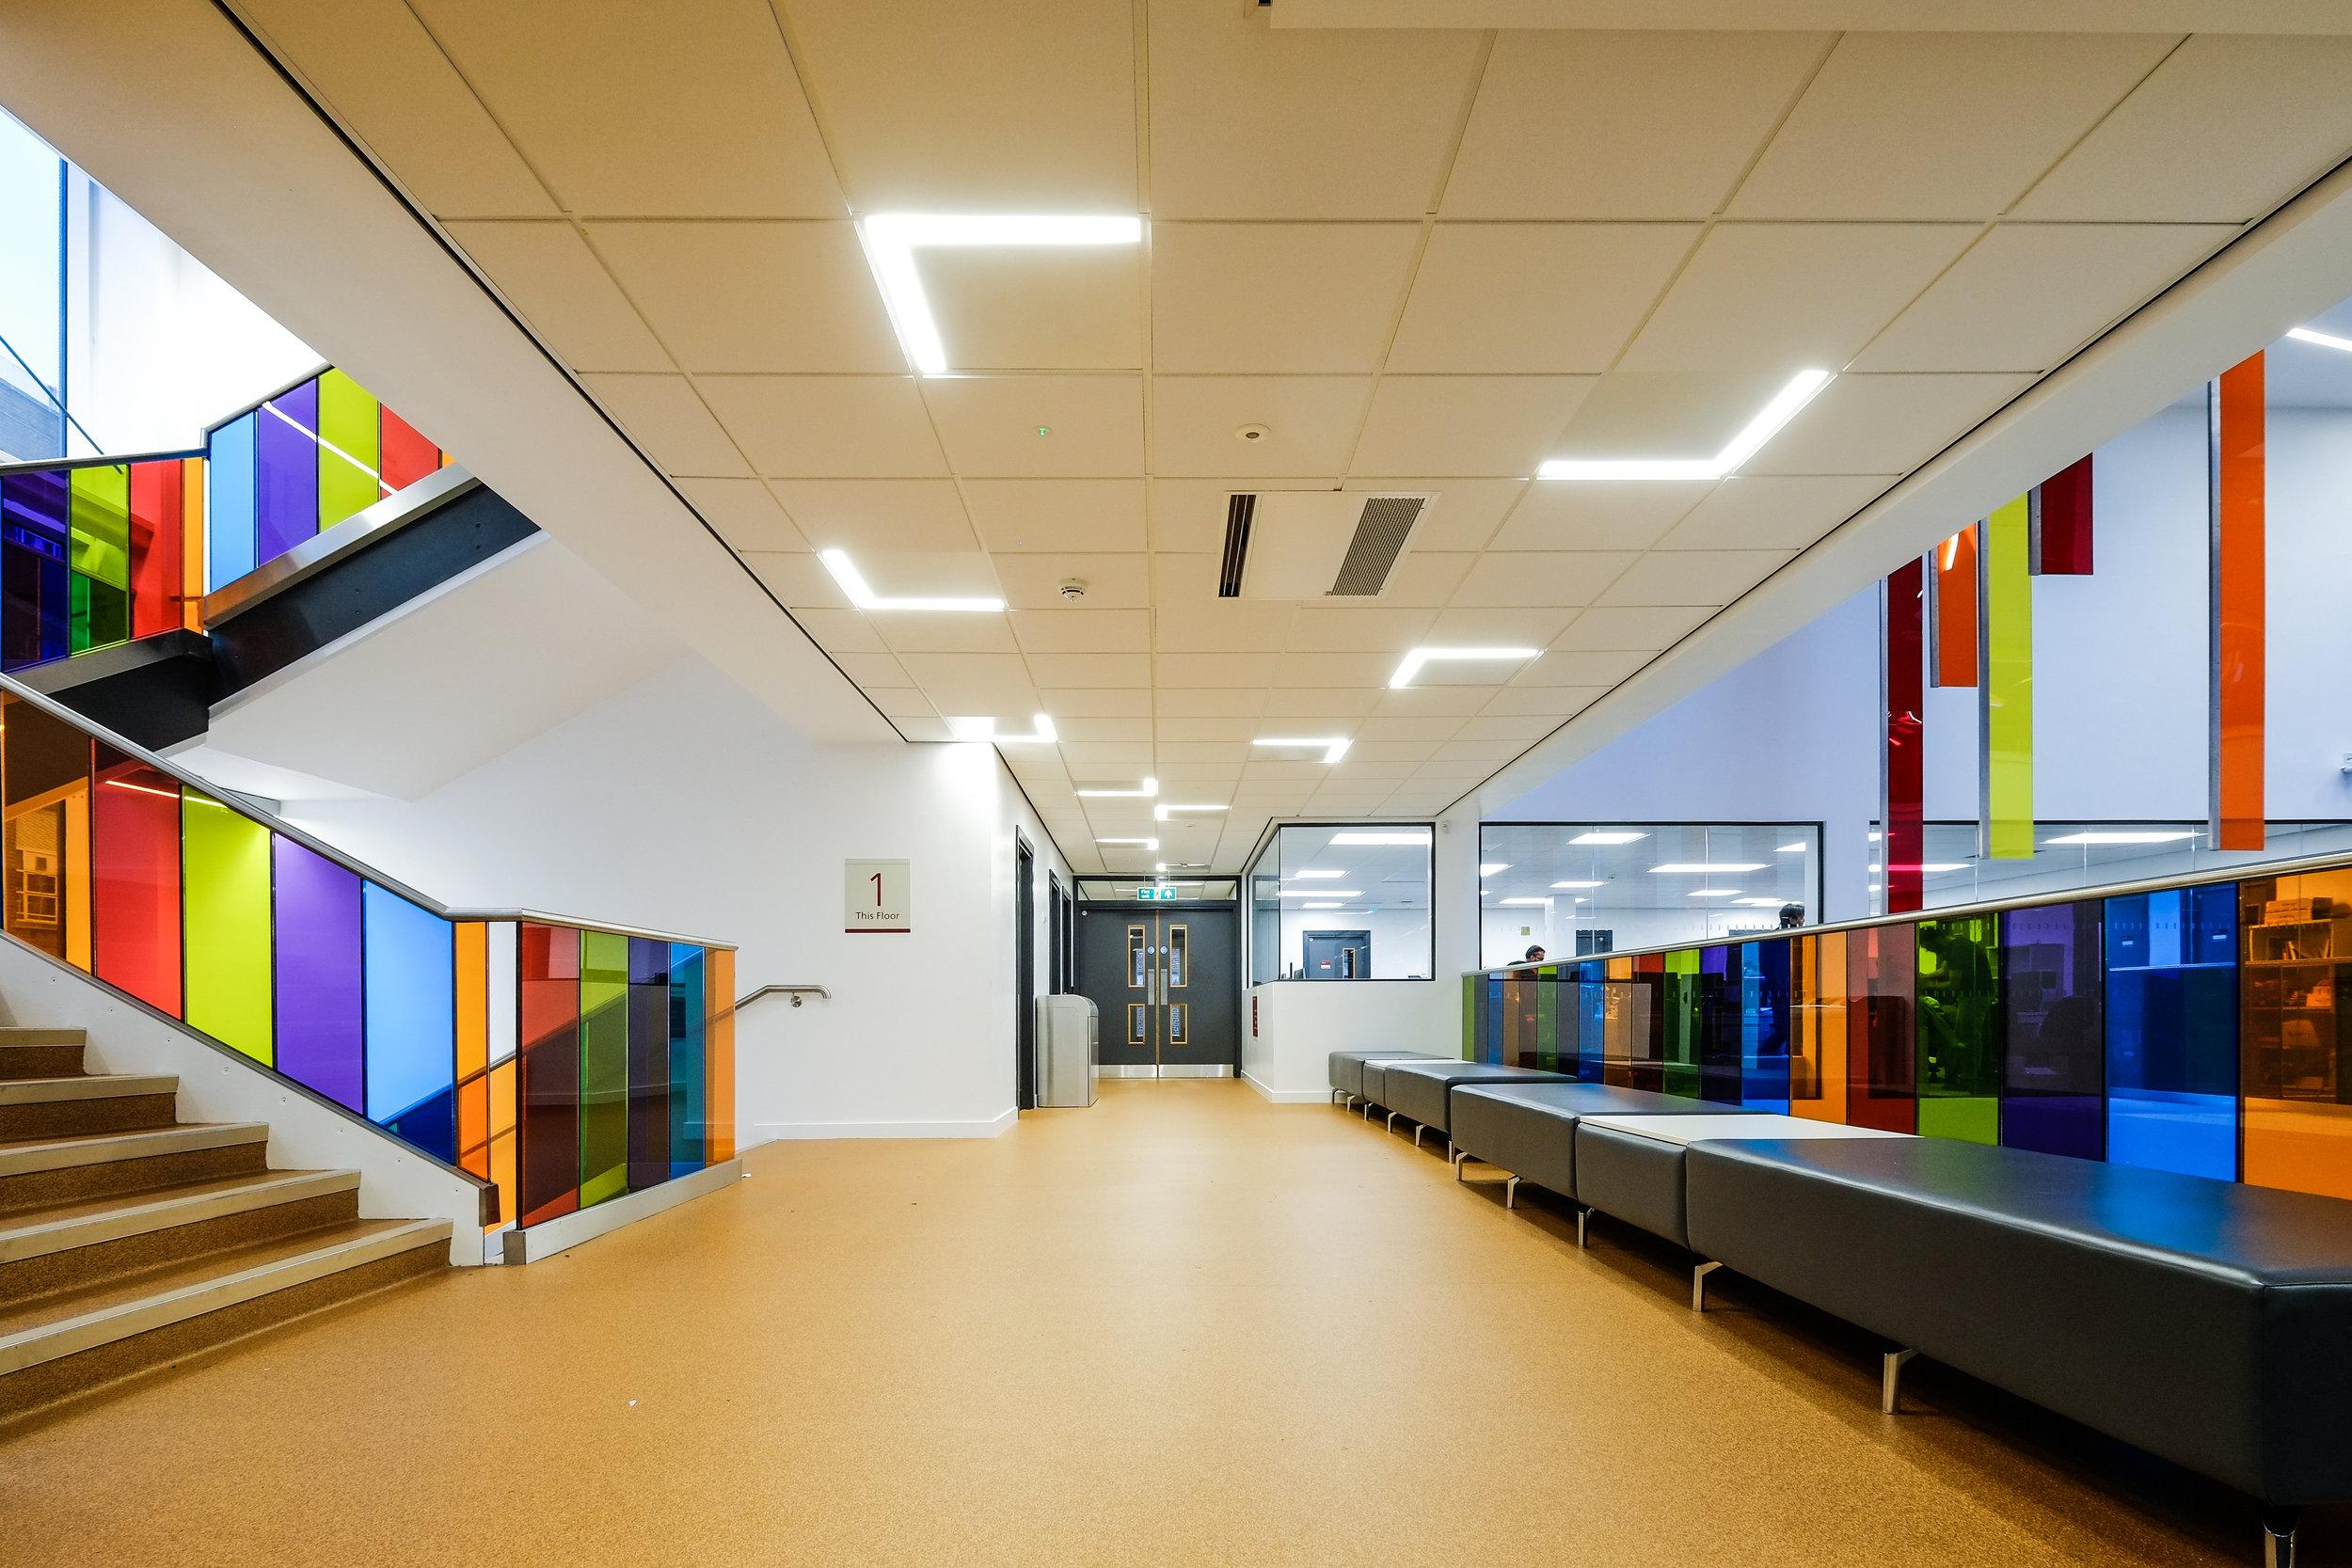 Bernard Crossland Building:  Bespoke modular luminaires for circulation spaces